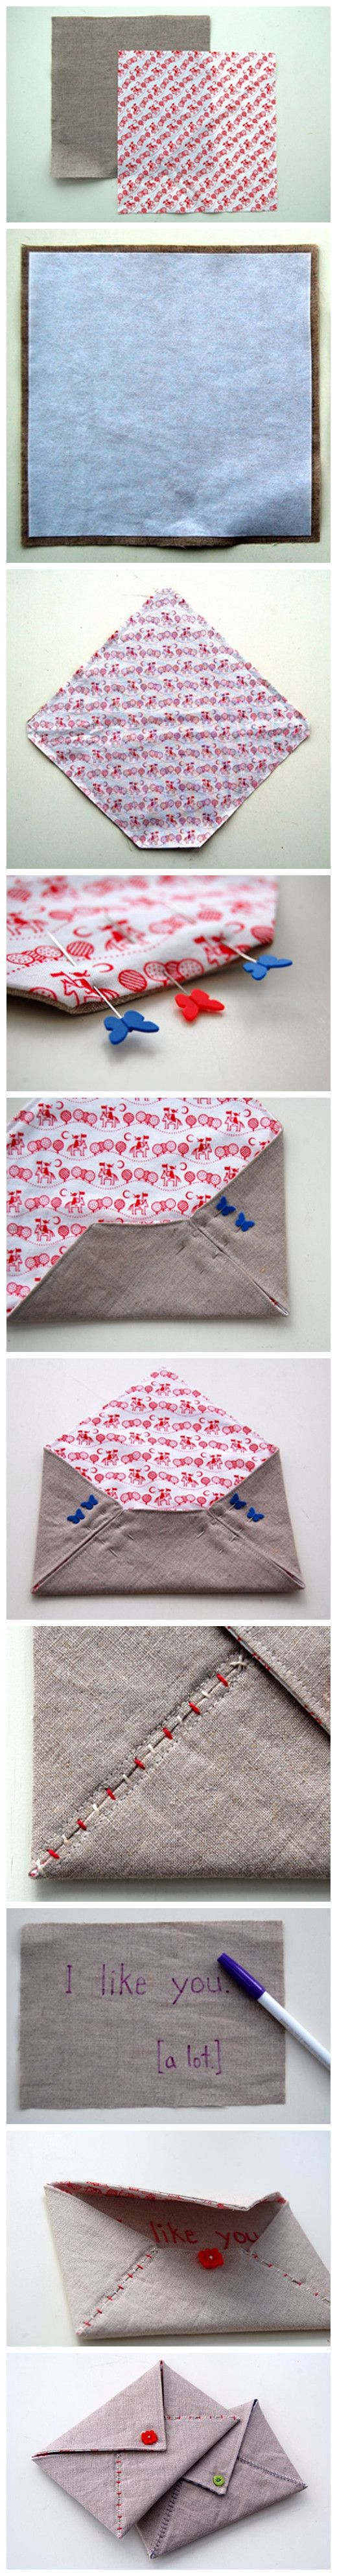 Stitched envelope